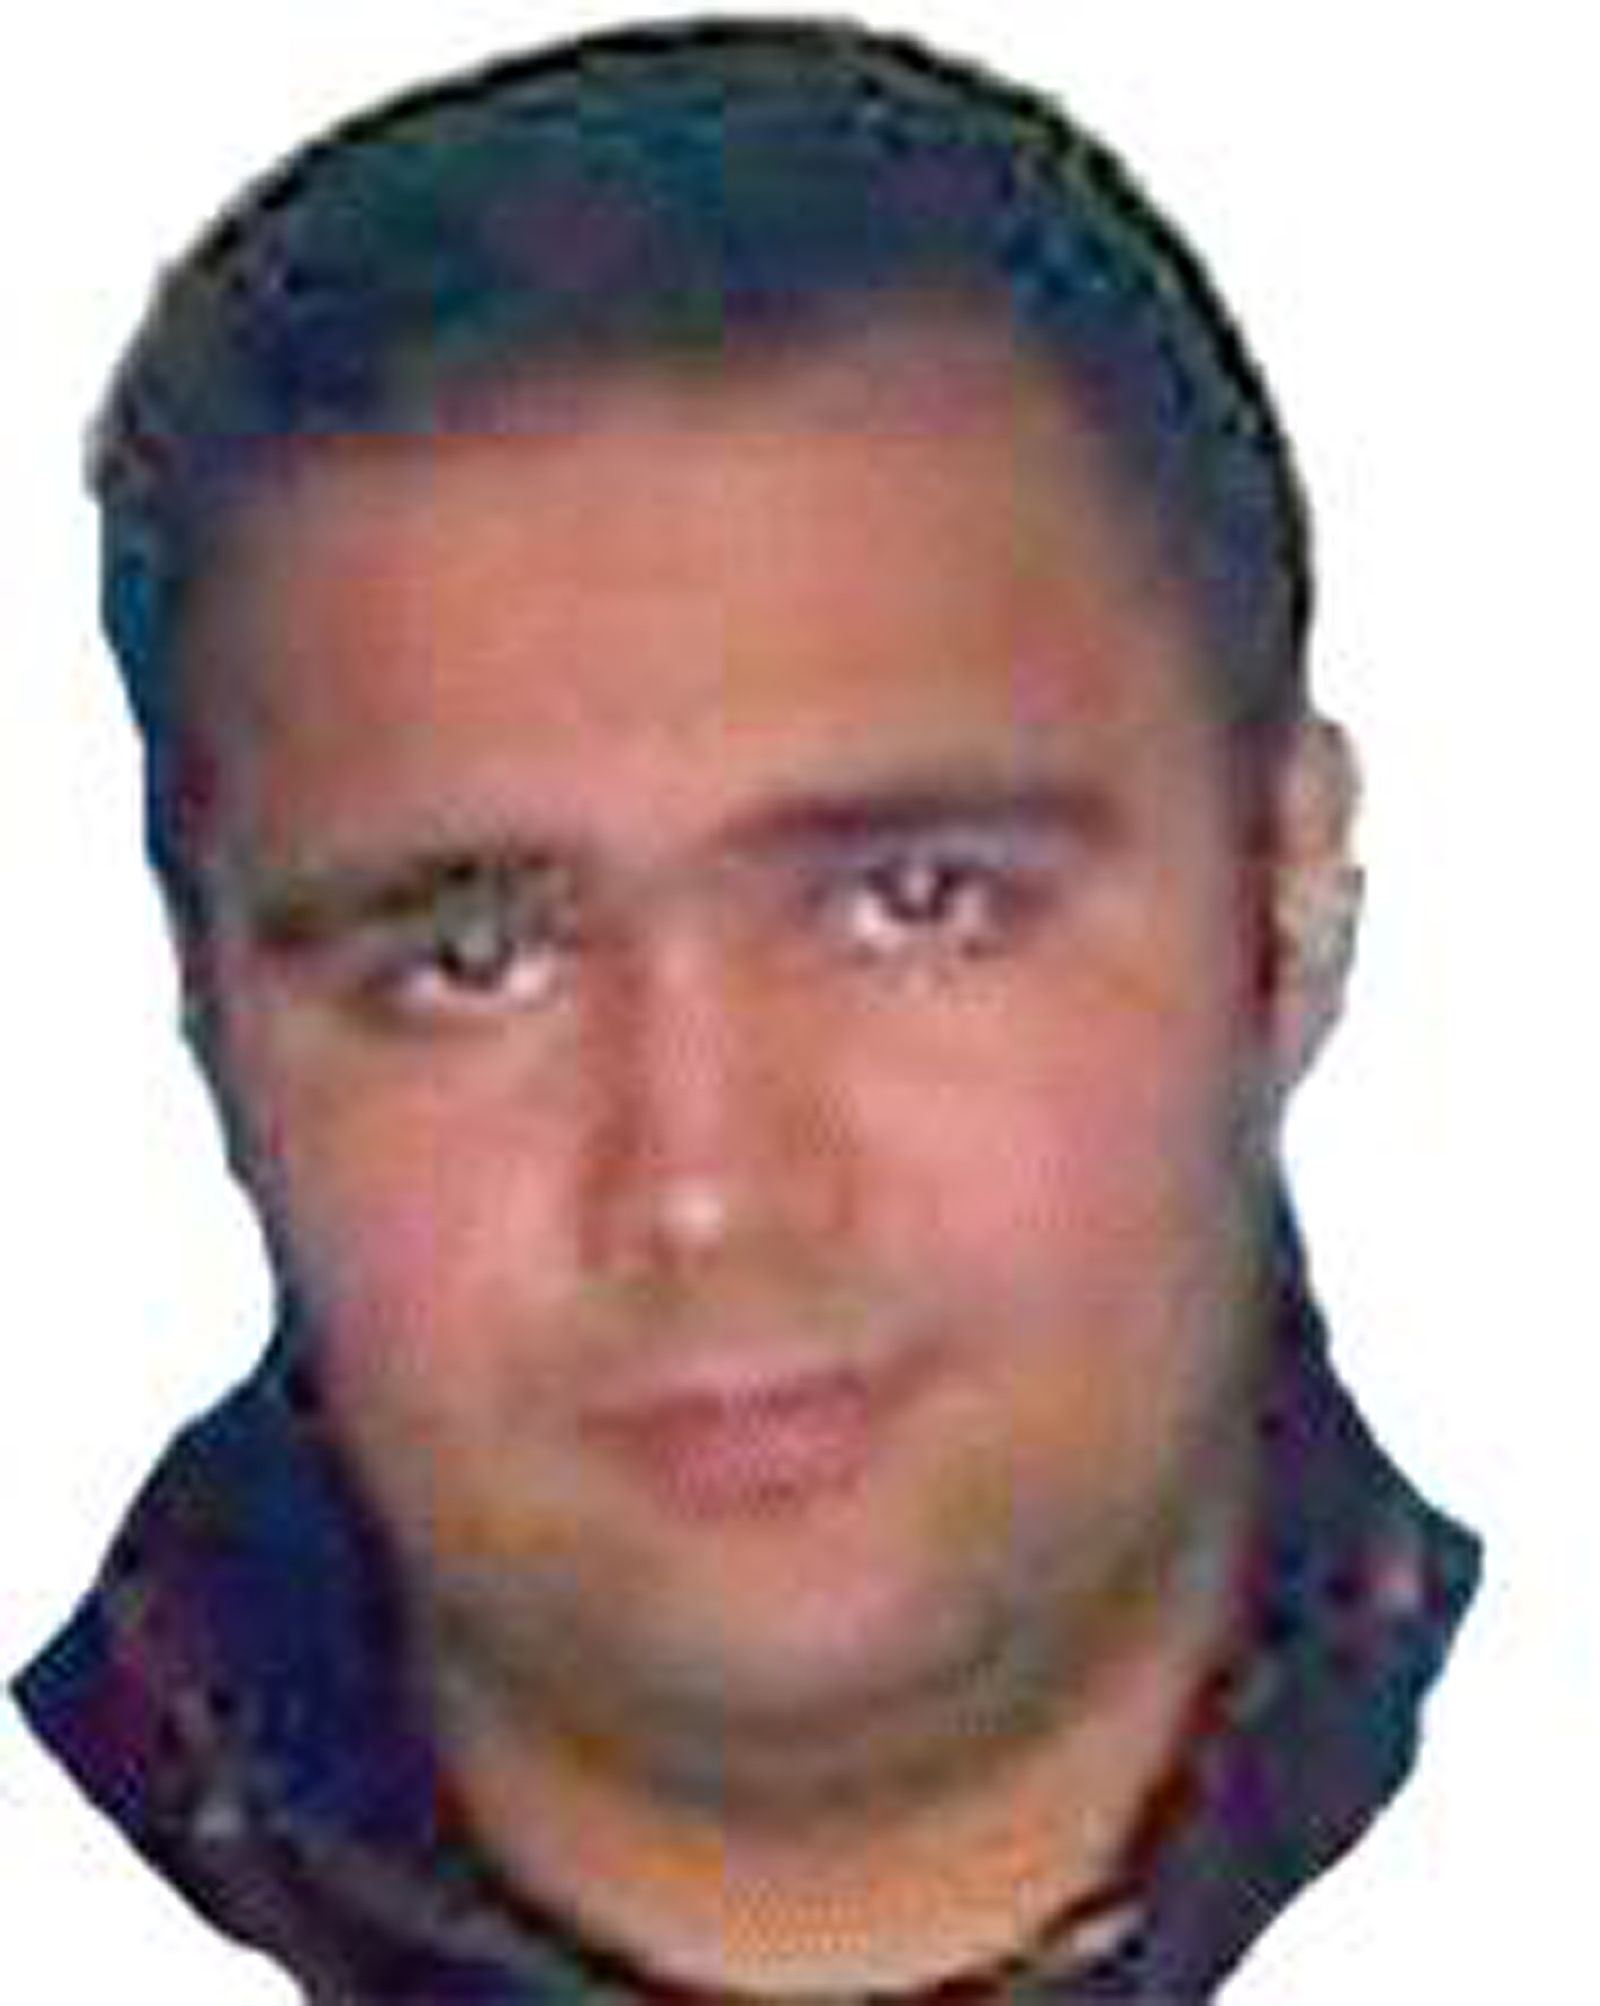 Neonazi-Mordserie - Halit Yozgat